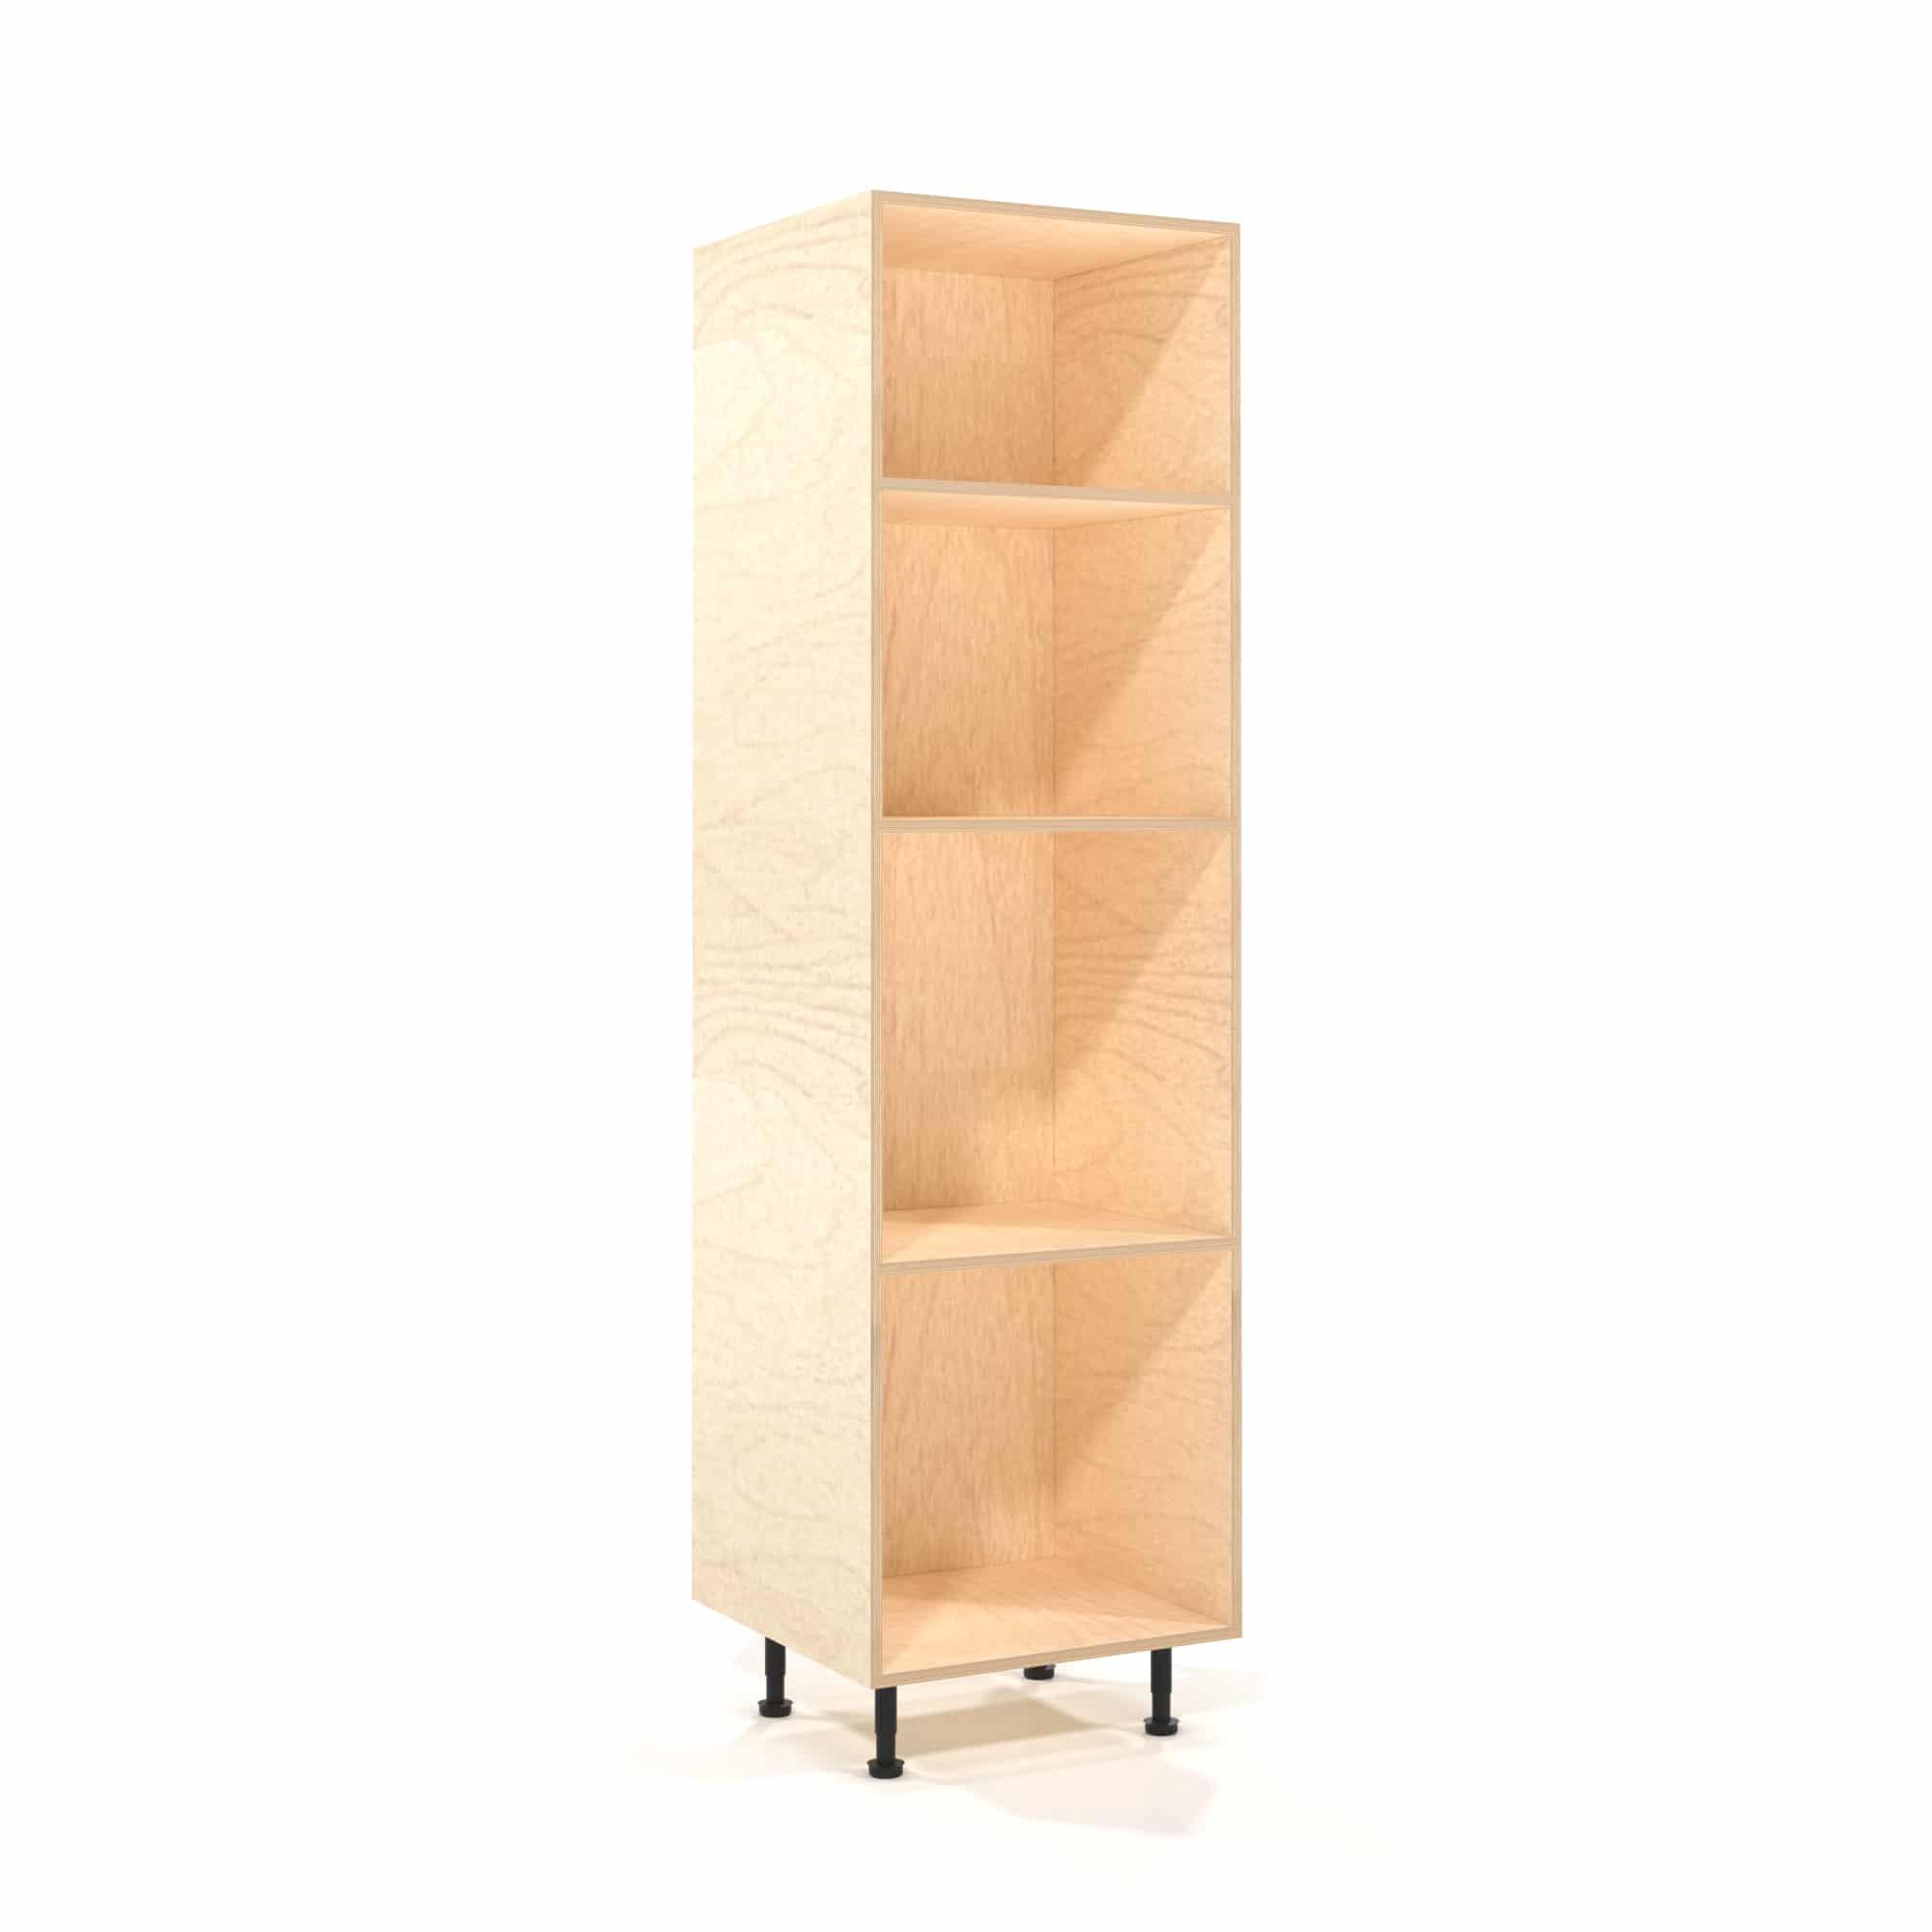 a rendering of a 600mm wide birch plywood kitchen larder unit